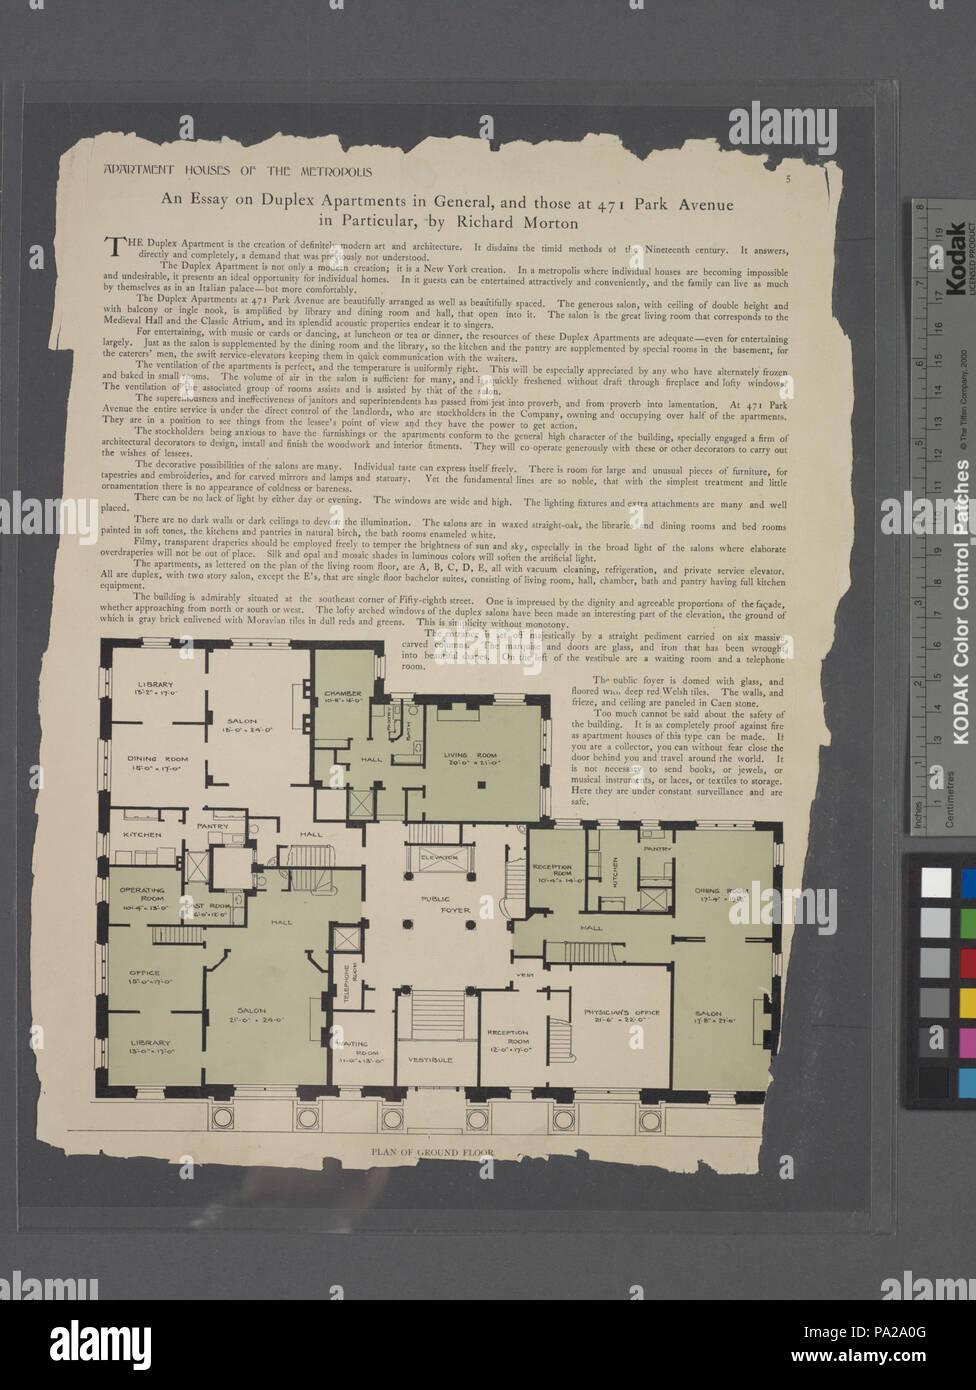 An essay on the floor treasure island thesis